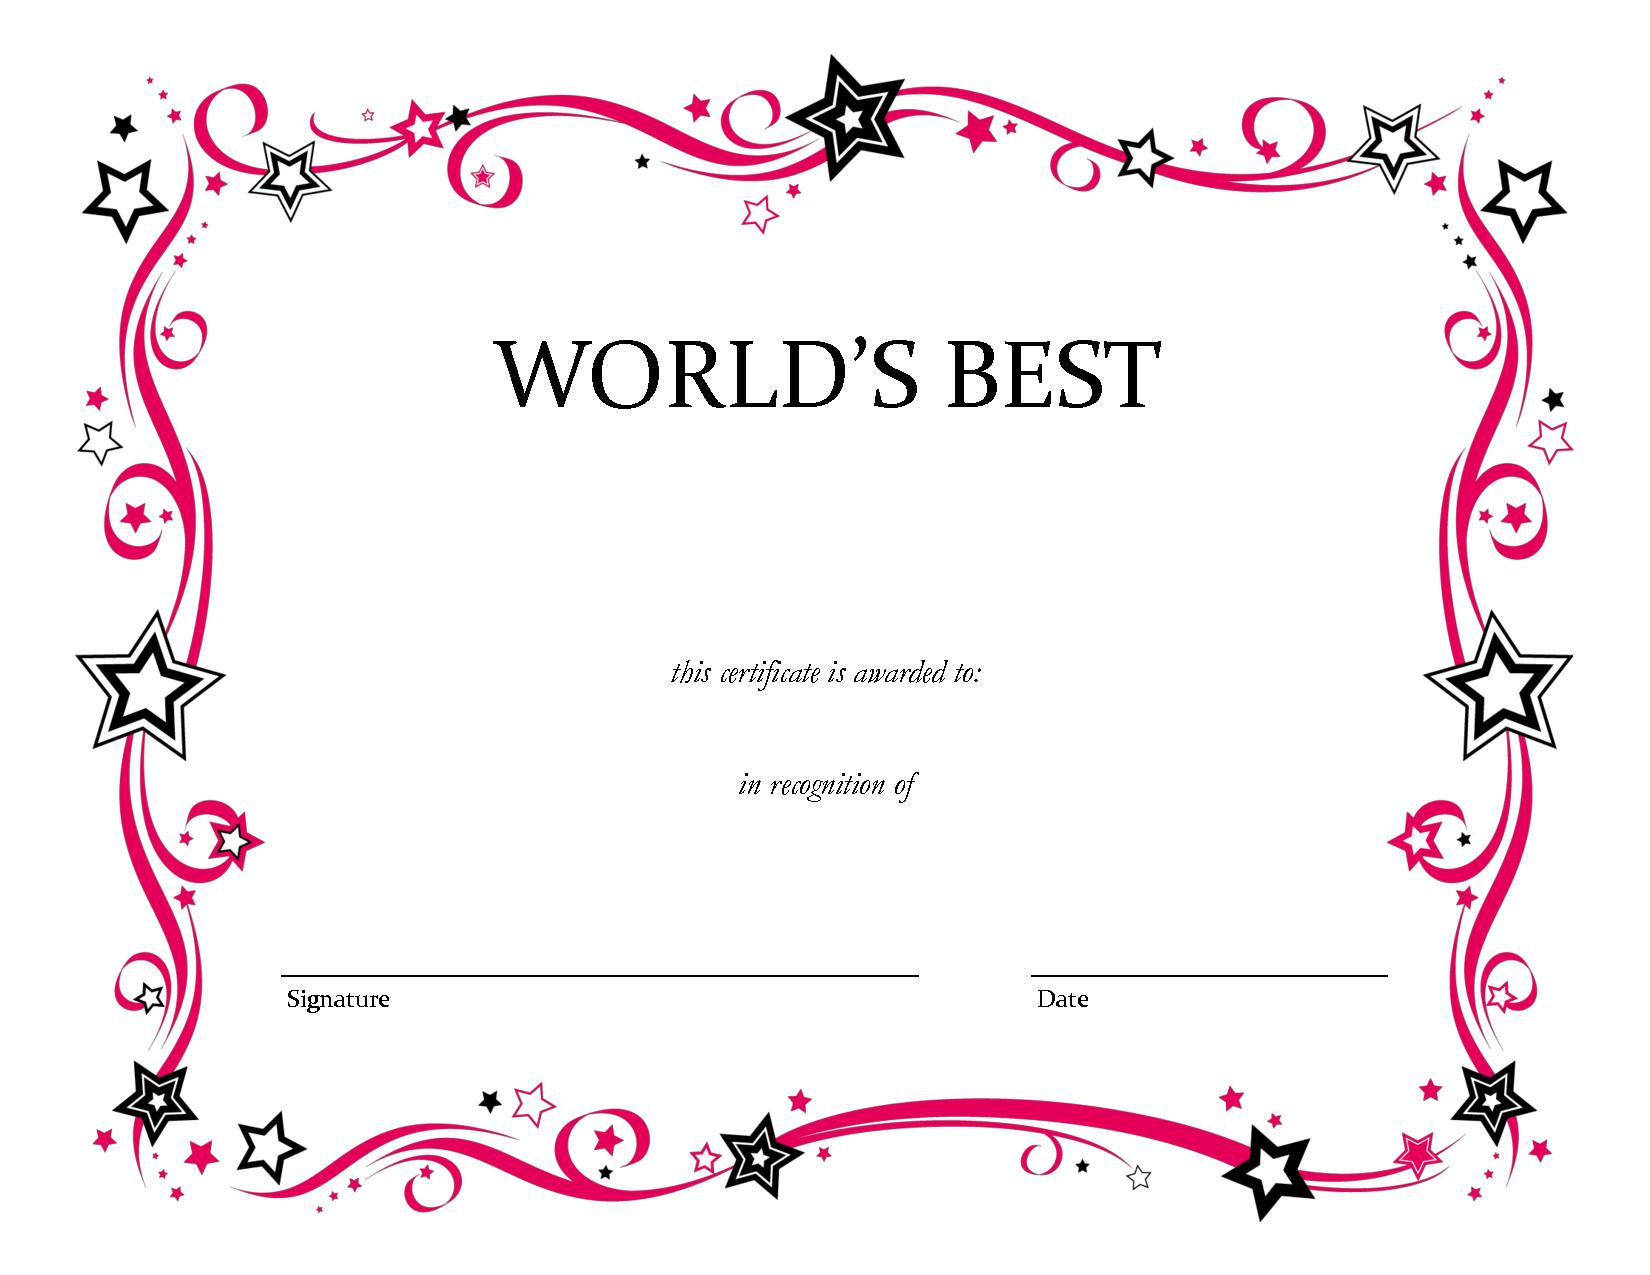 Free Printable Blank Award Certificate Templates Chainimage Throughout Free Printable Blank Award Certificate Templates